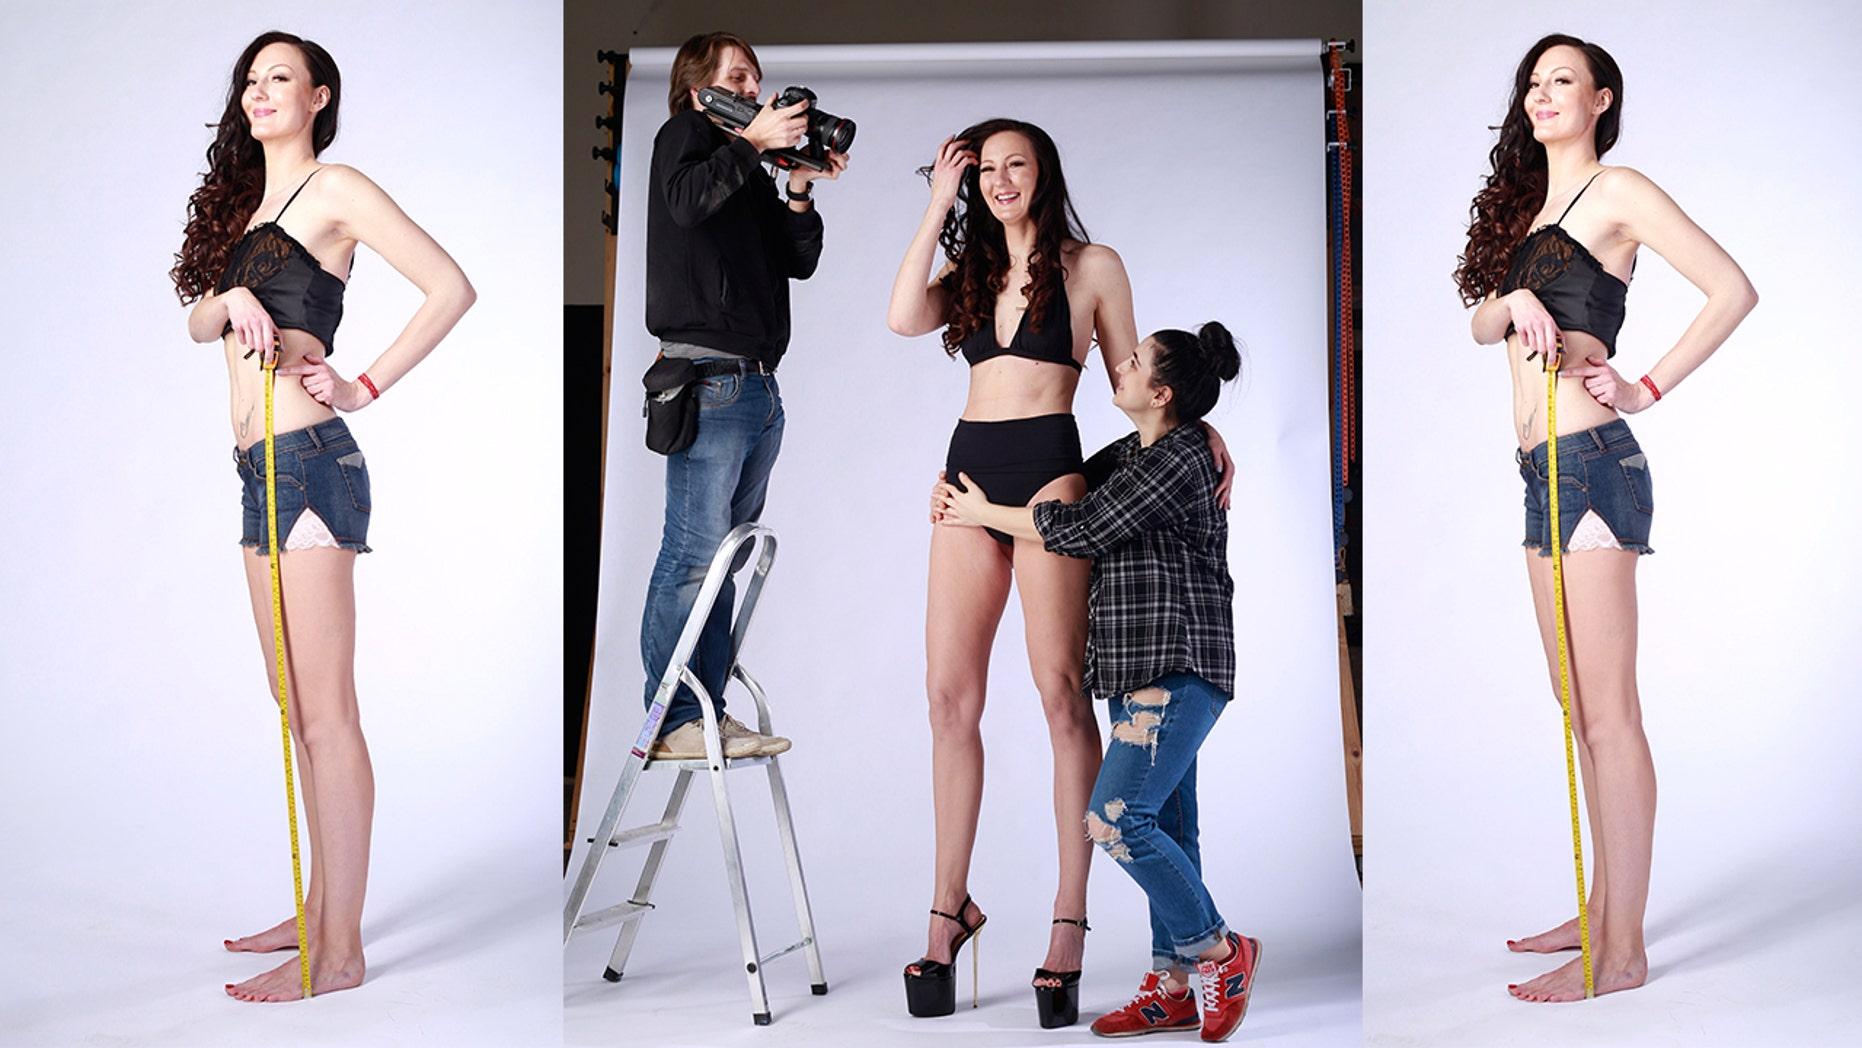 Russian model Ekaterina Lisina wants the world record for longest legs